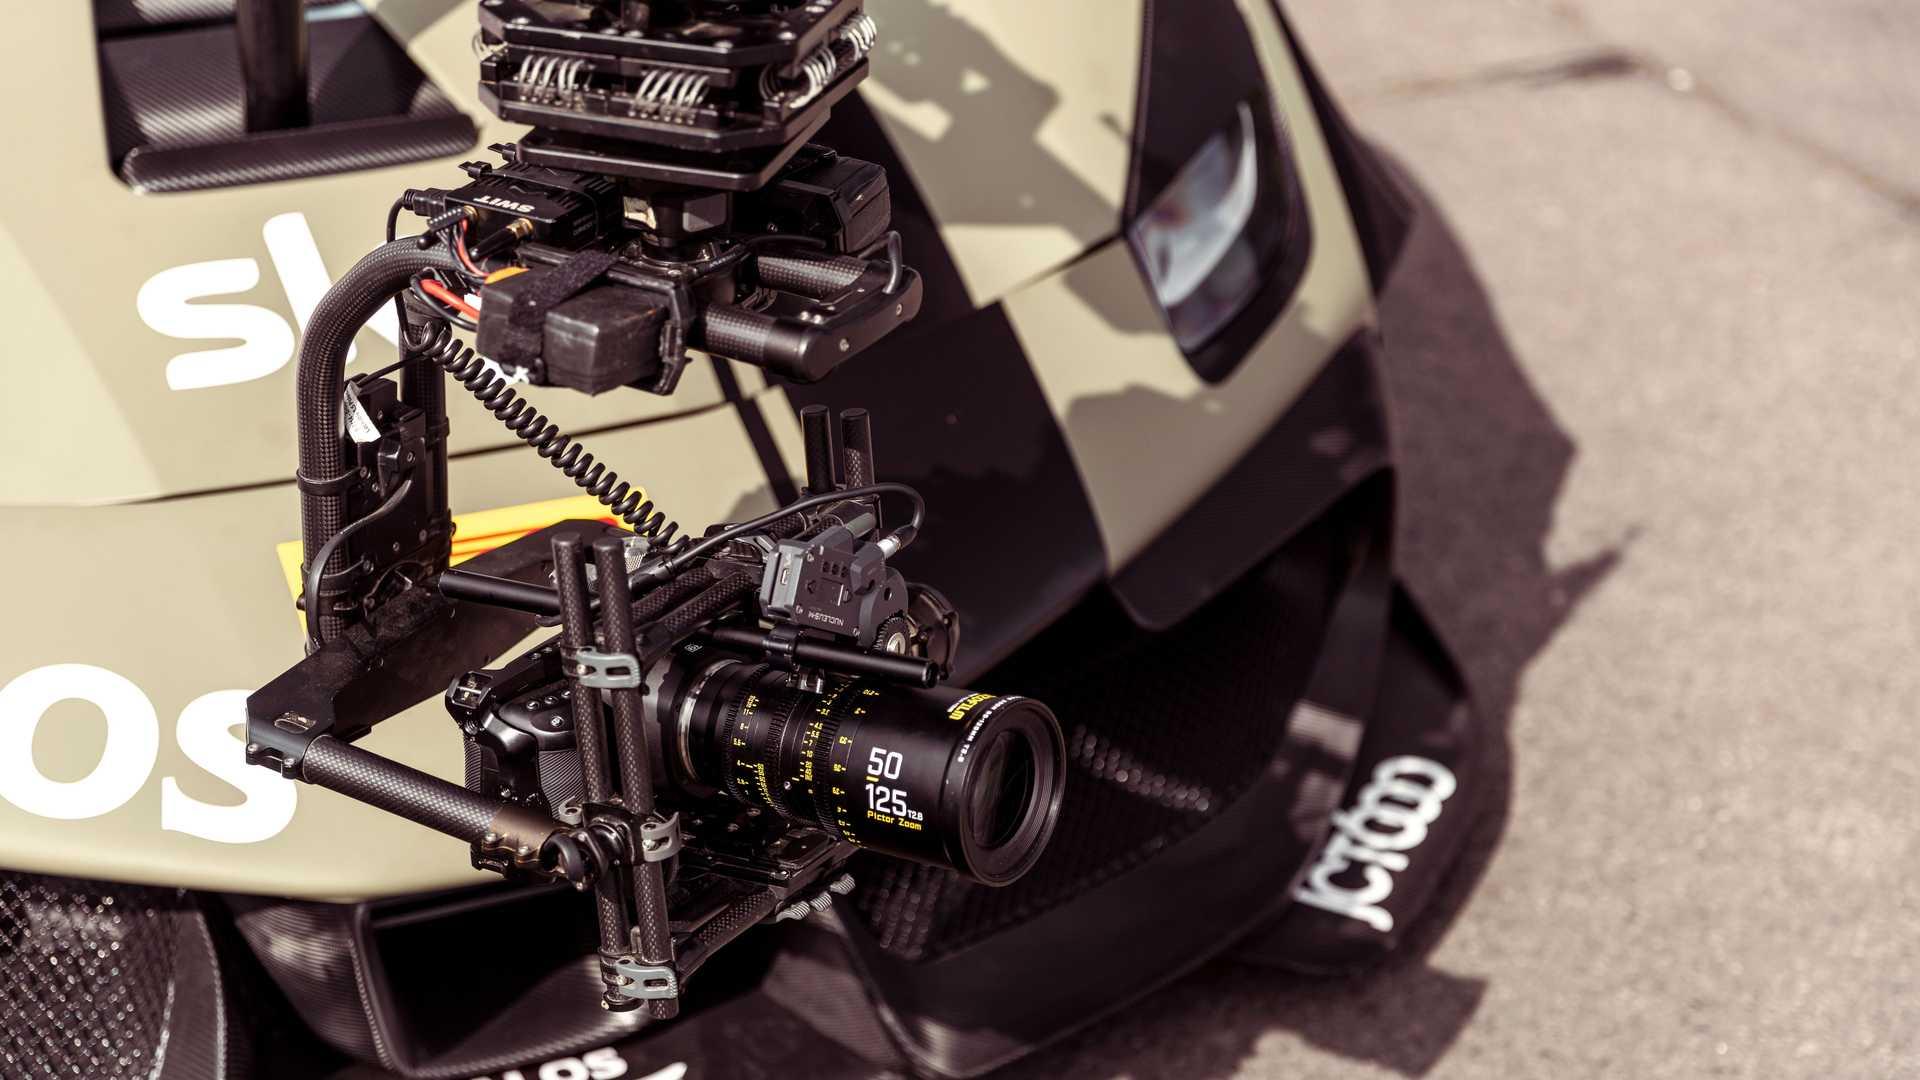 Ferrari-488-Challenge-Camera-Car-6